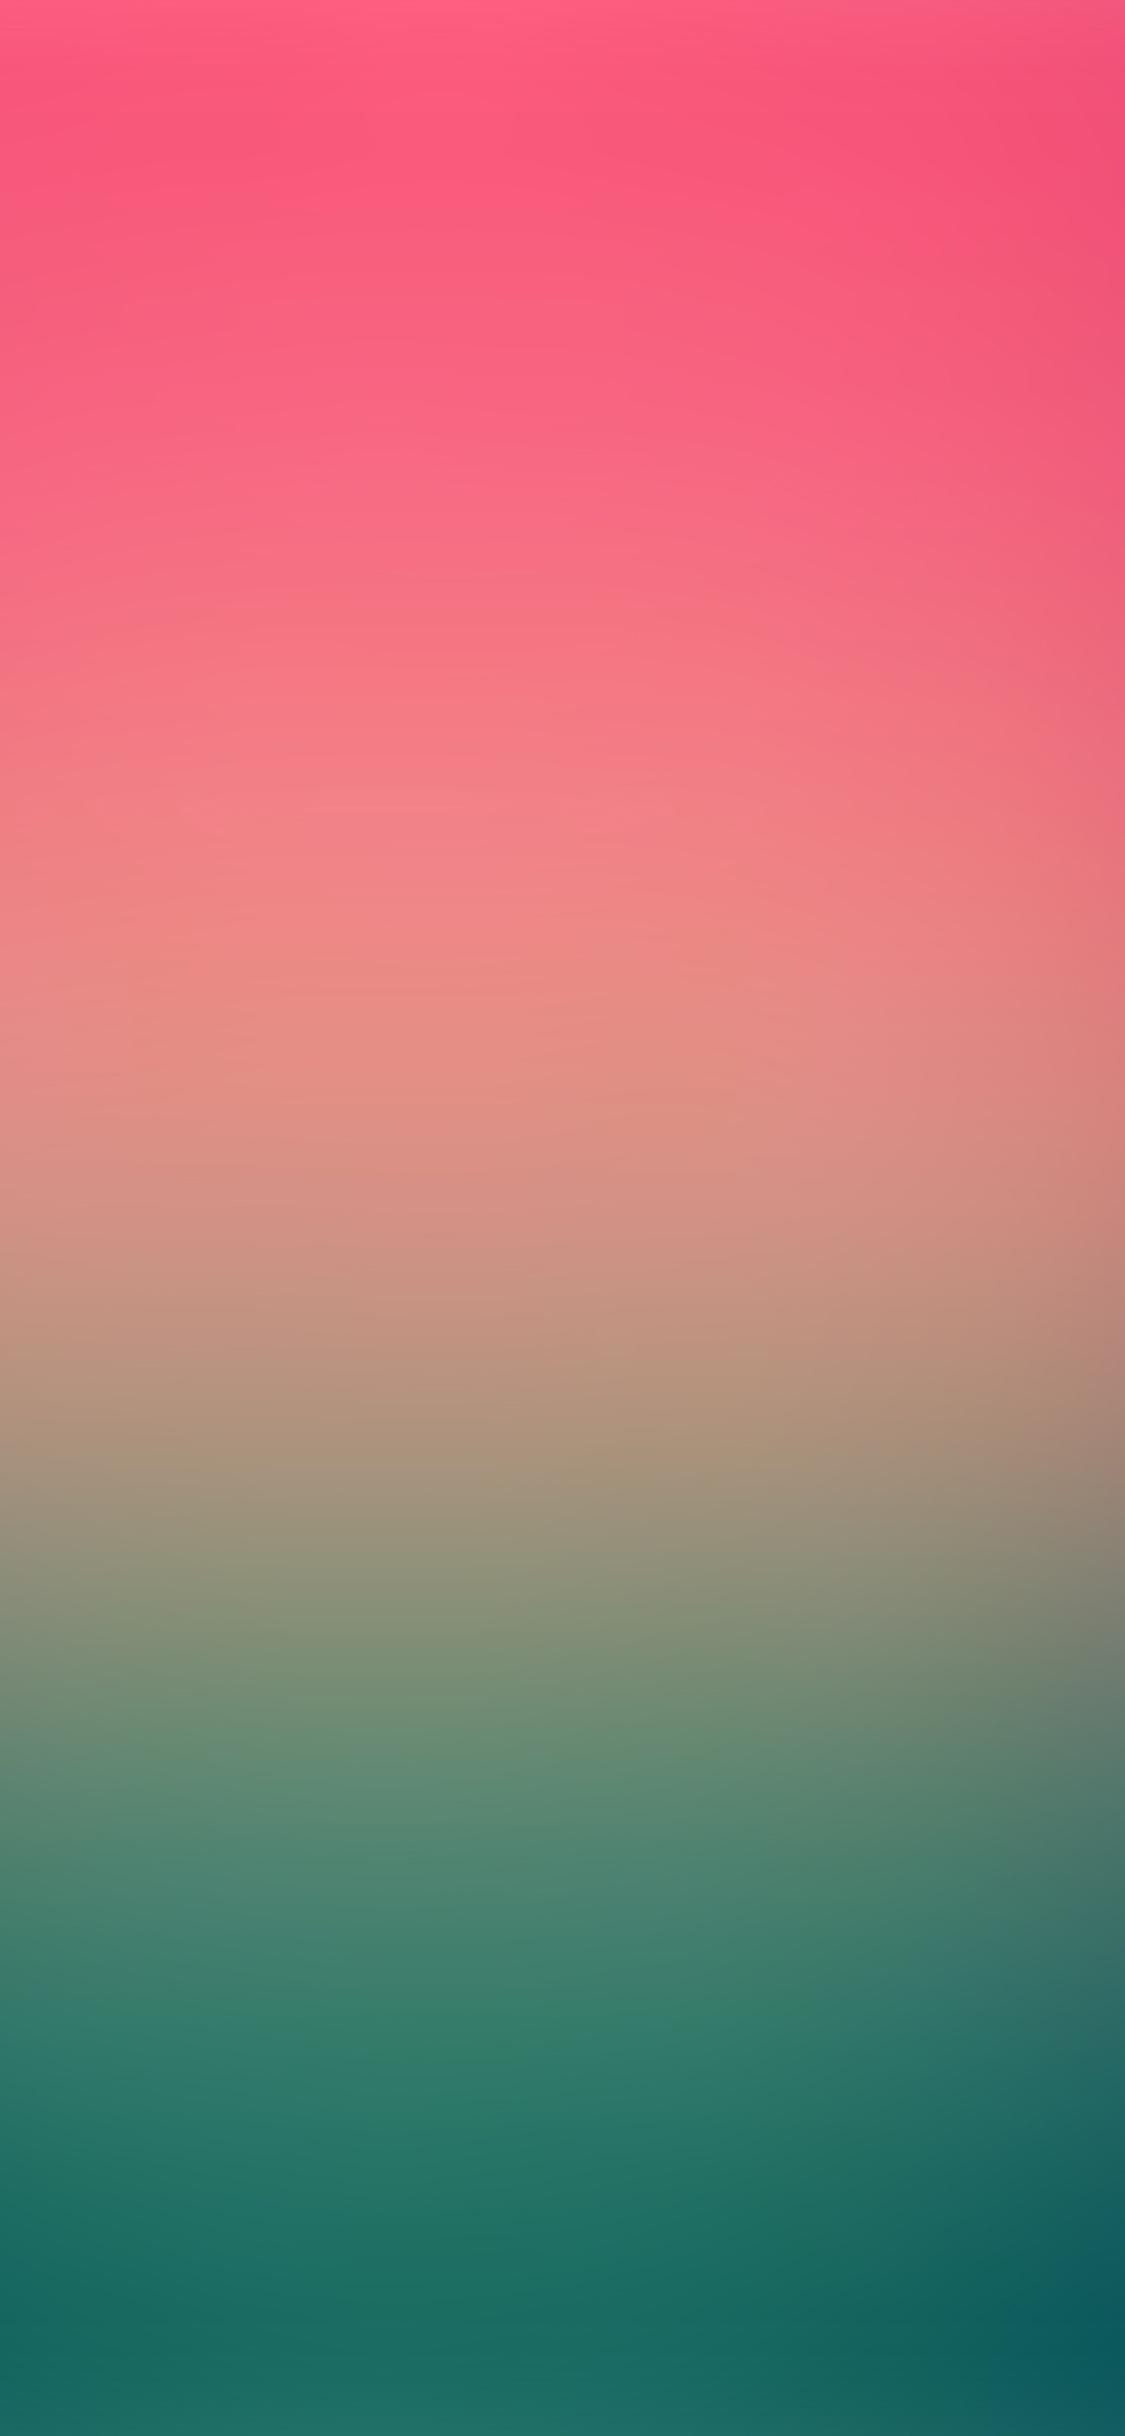 iPhoneXpapers.com-Apple-iPhone-wallpaper-sk82-red-green-blur-gradation